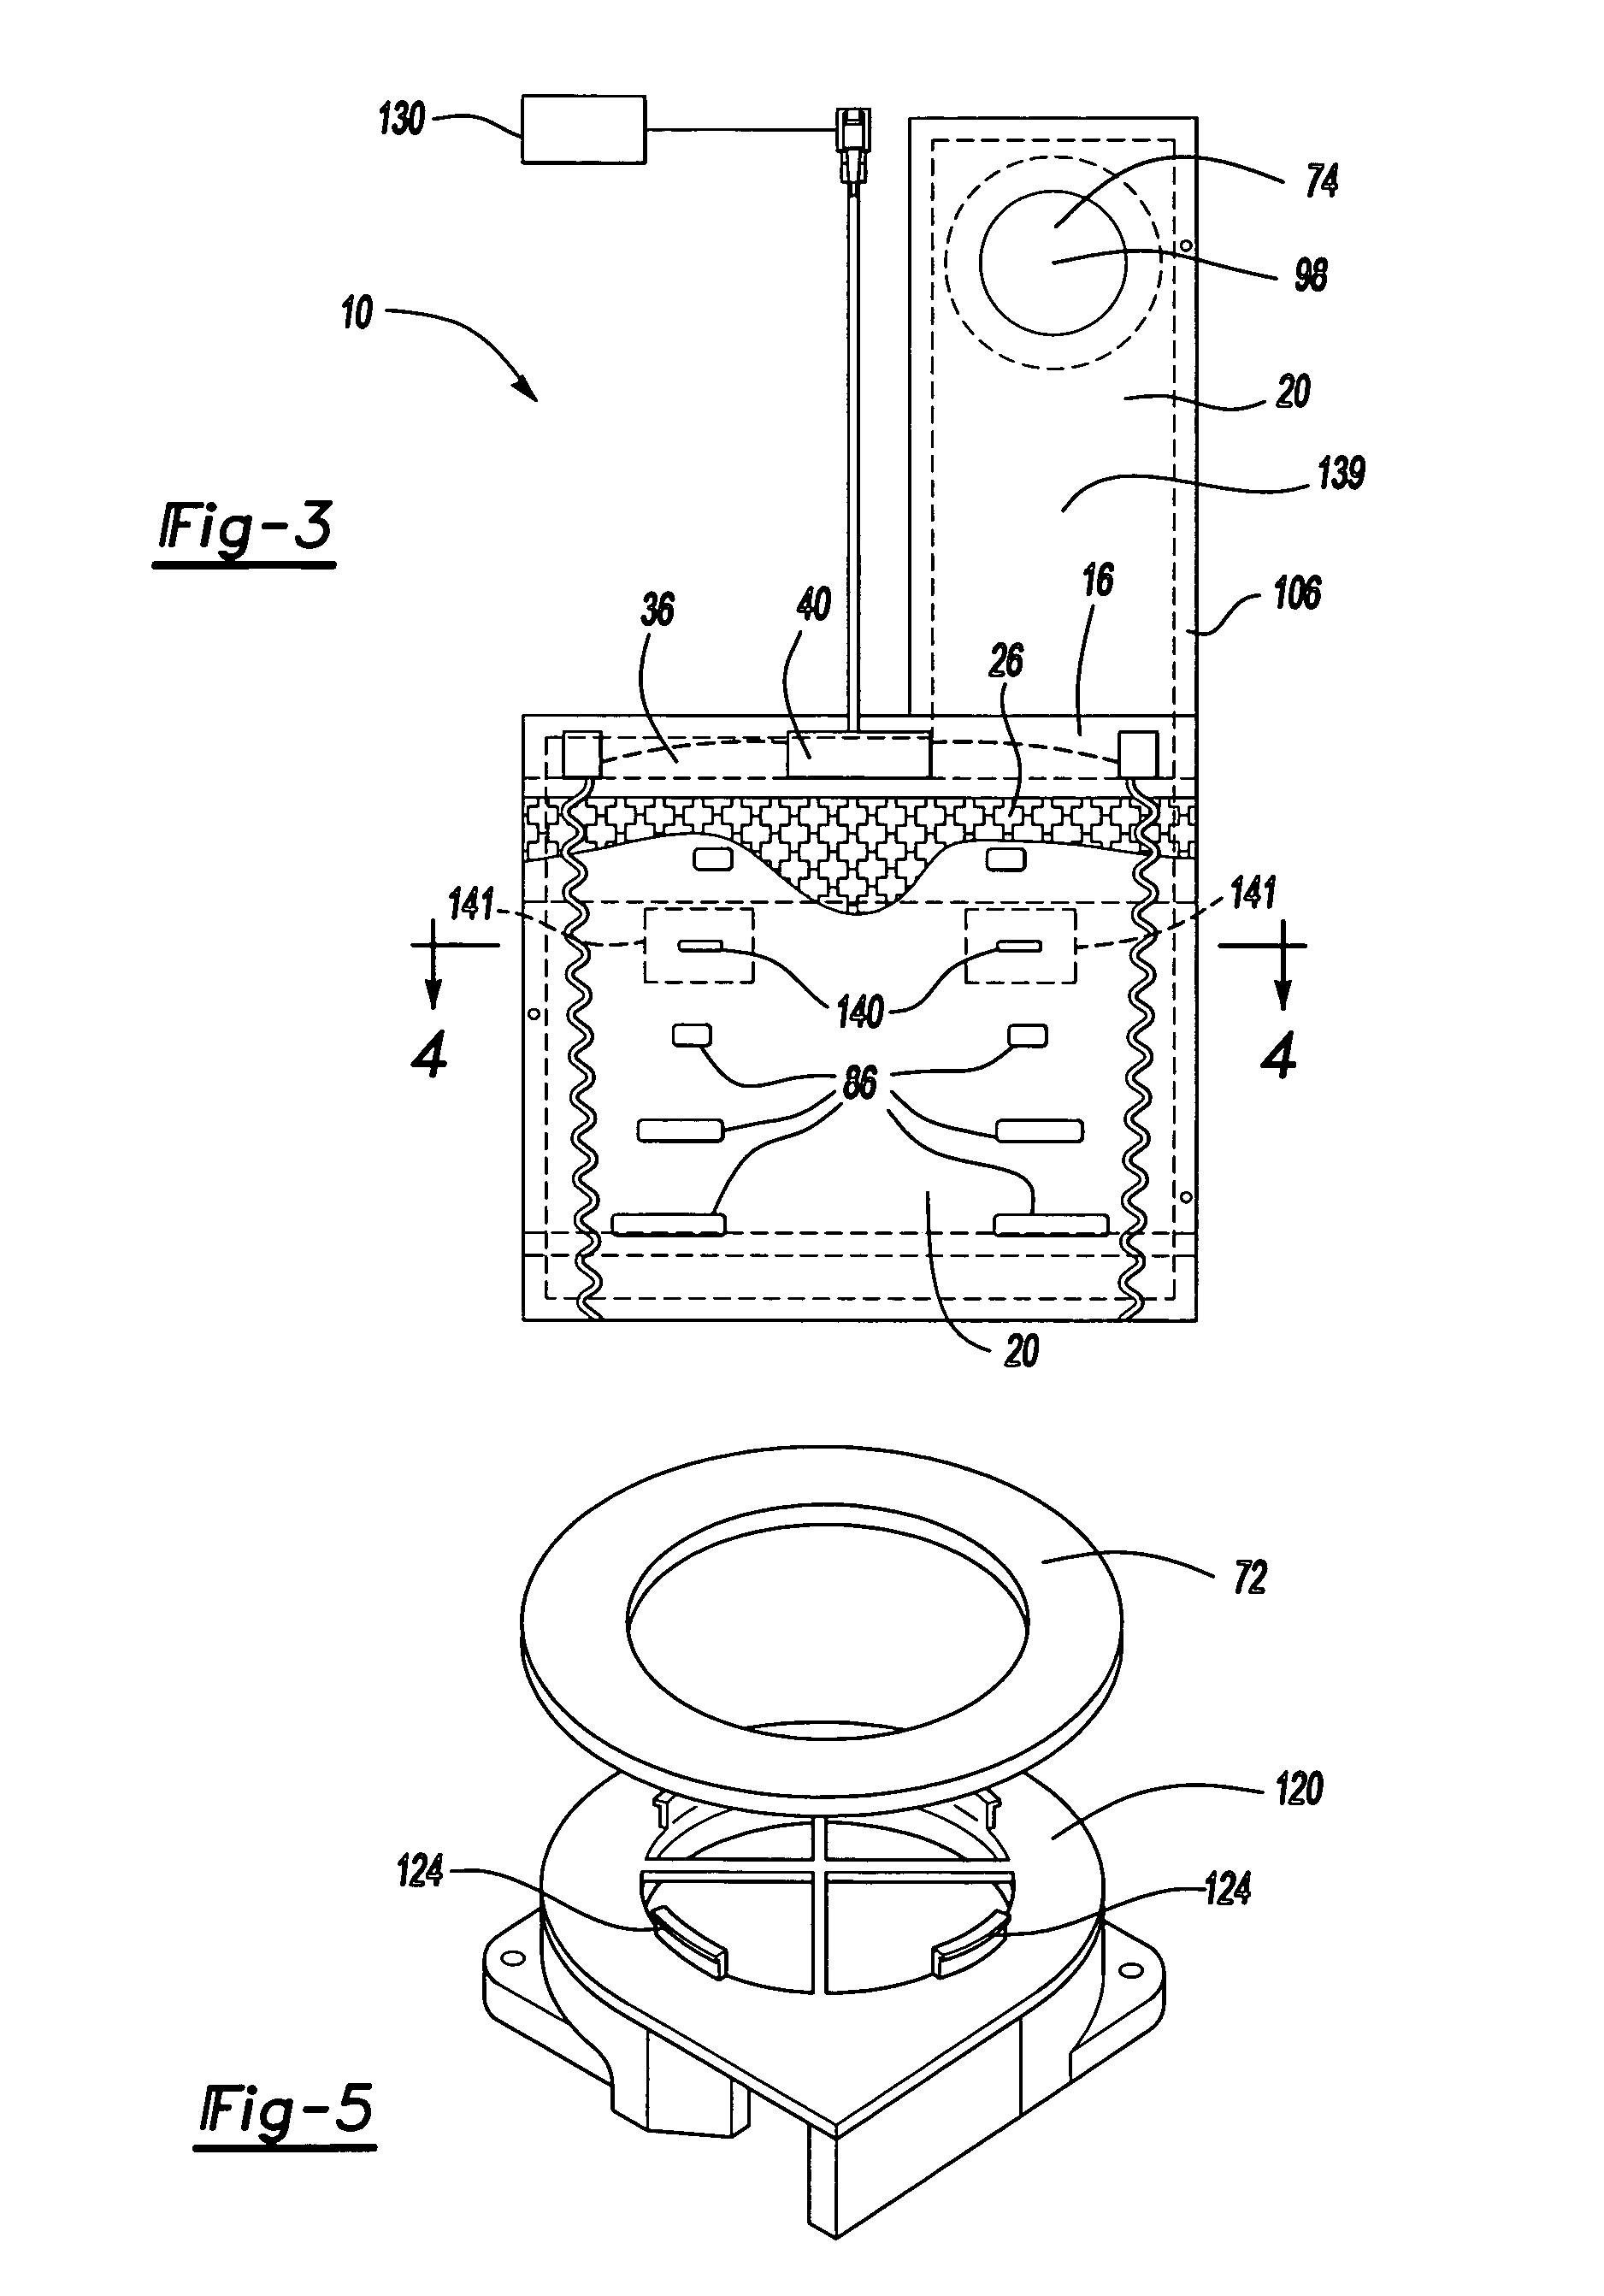 Circuit Electric For Guide: 2007 pontiac g6 fuse box diagram